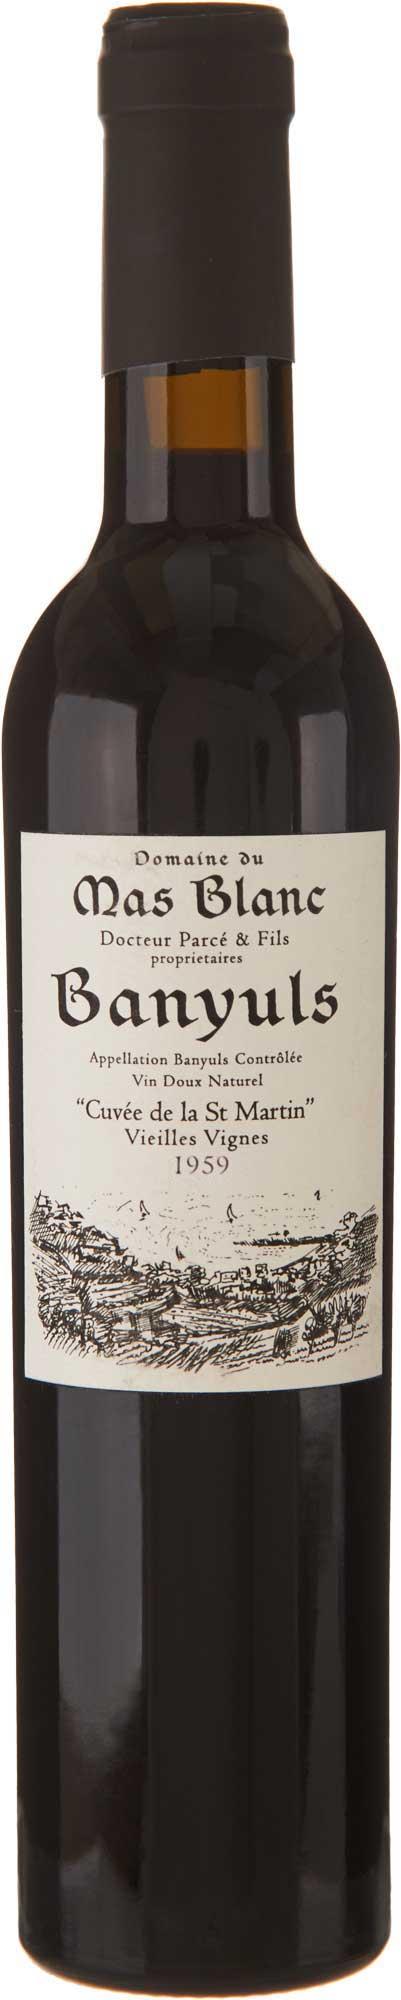 Domaine du Mas Blanc Banyuls 'Cuvée St. Martin' 1959